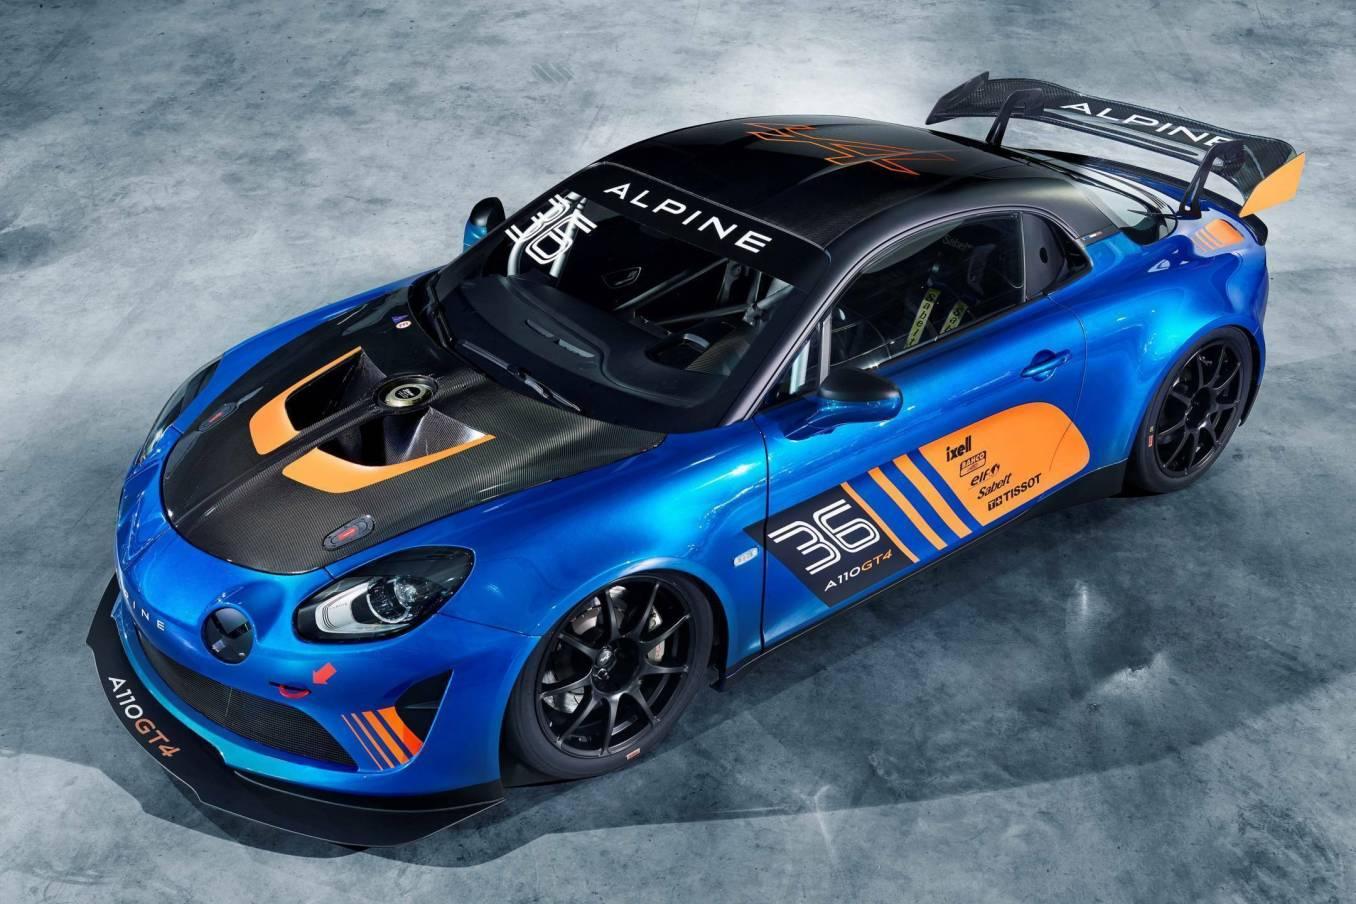 Alpine A110 GT4 Signatech Salon de Genève Racing 2018 2 | Alpine dévoile son A110 GT4 au Salon de Genève avec Signatech !